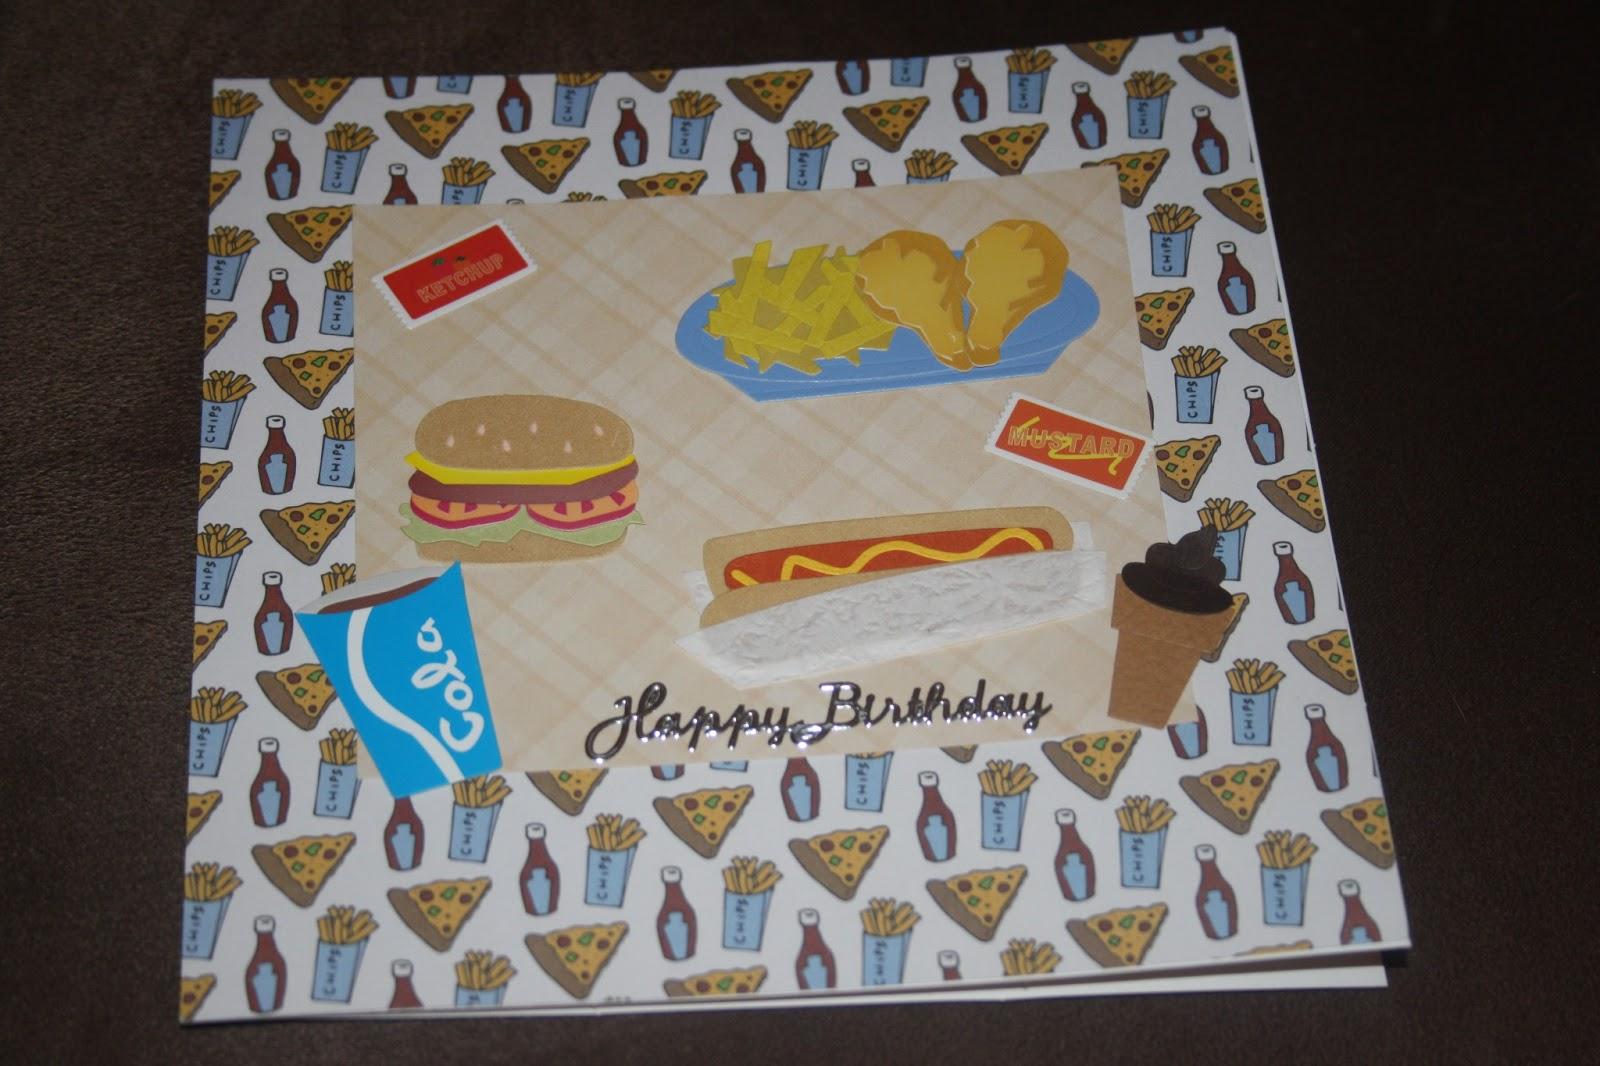 Homemade Birthday Cakes For Boyfriend I made my boyfriend a birthday